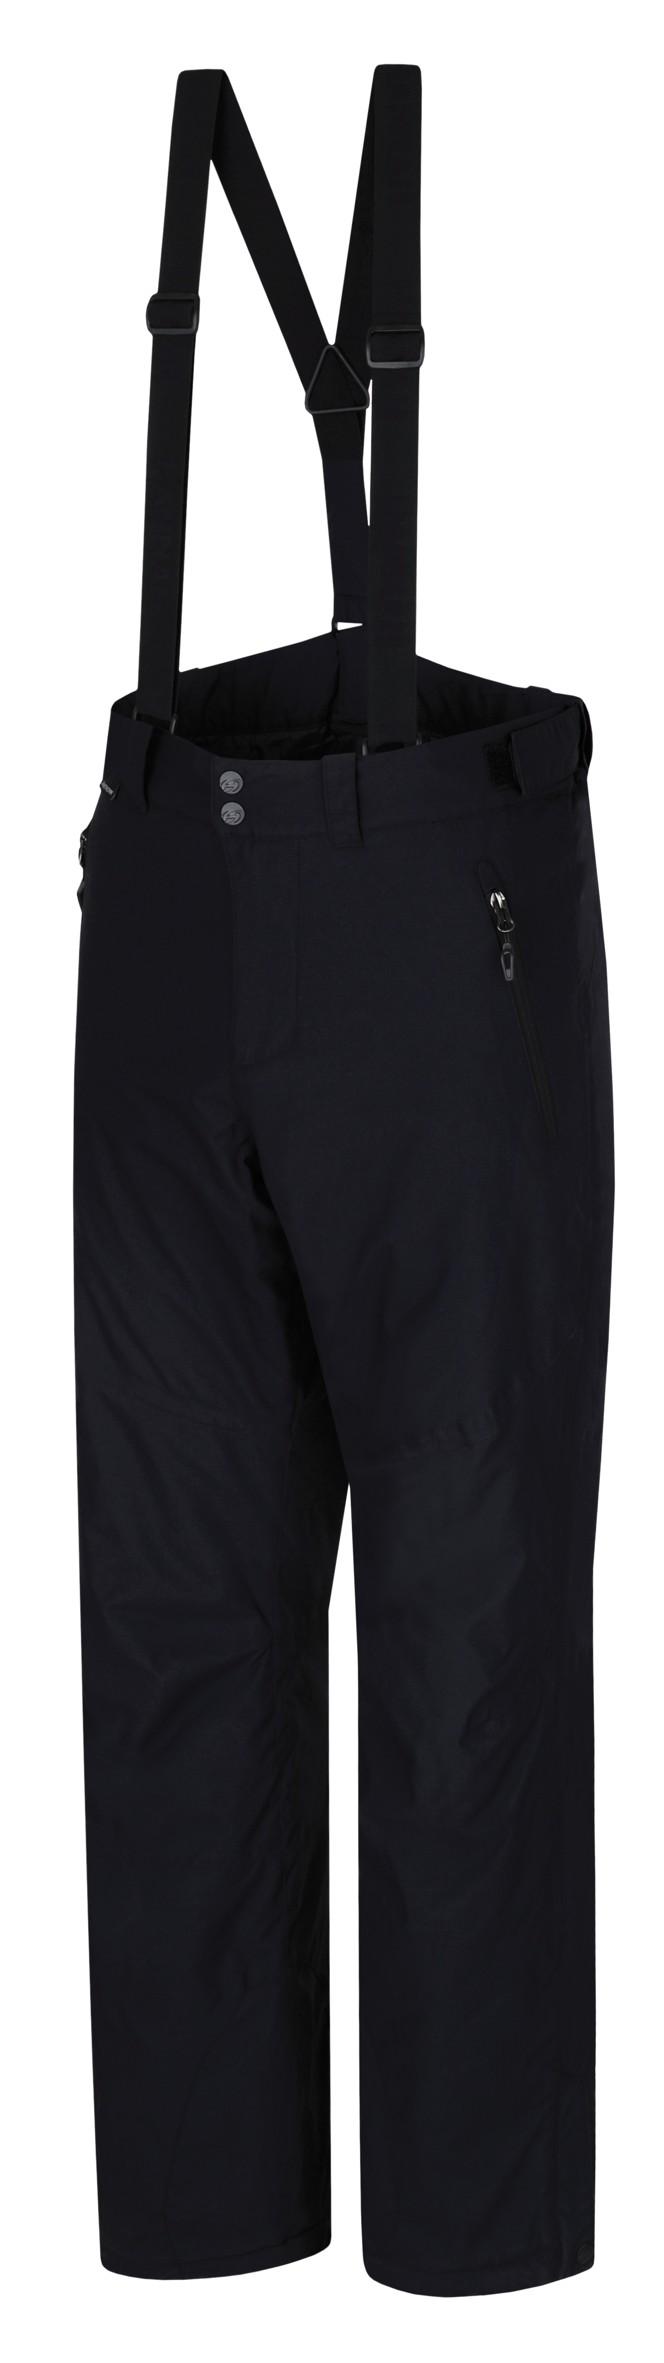 Pantaloni schi barbati Hannah Grant Antracit imagine